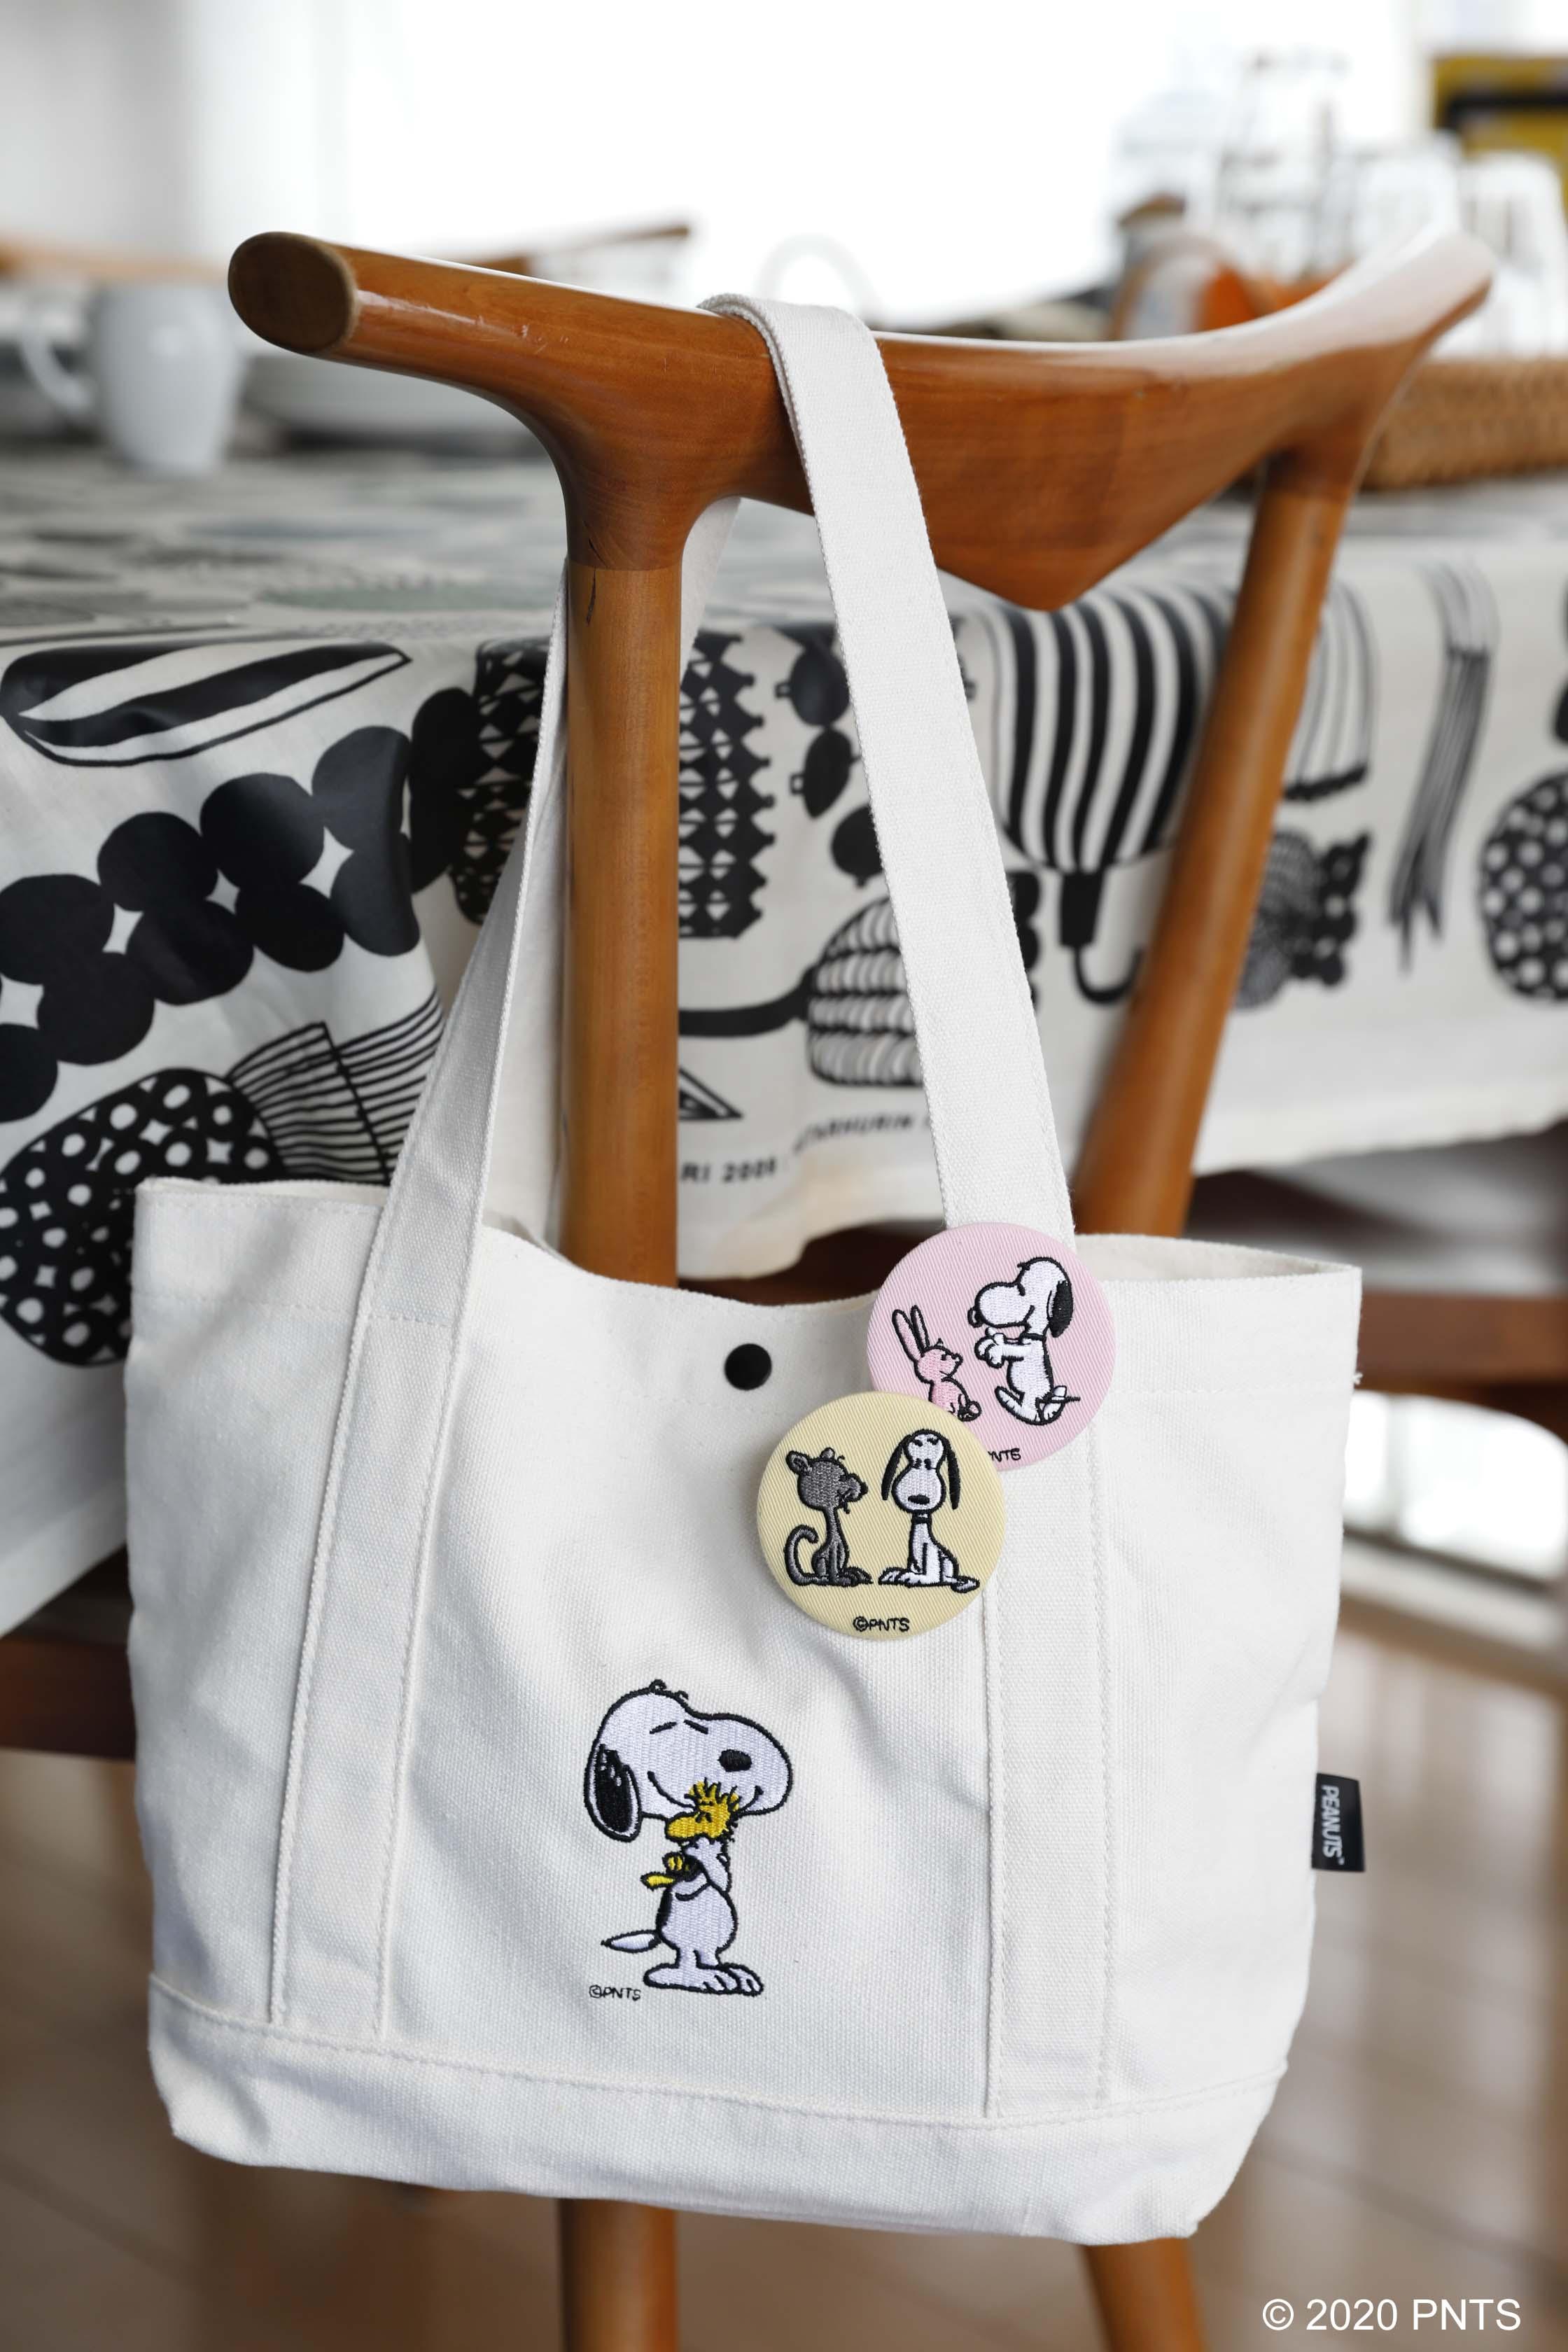 「SNOOPY x WOODSTOCK 刺繍トートバッグ& 刺繍缶バッジ」画像